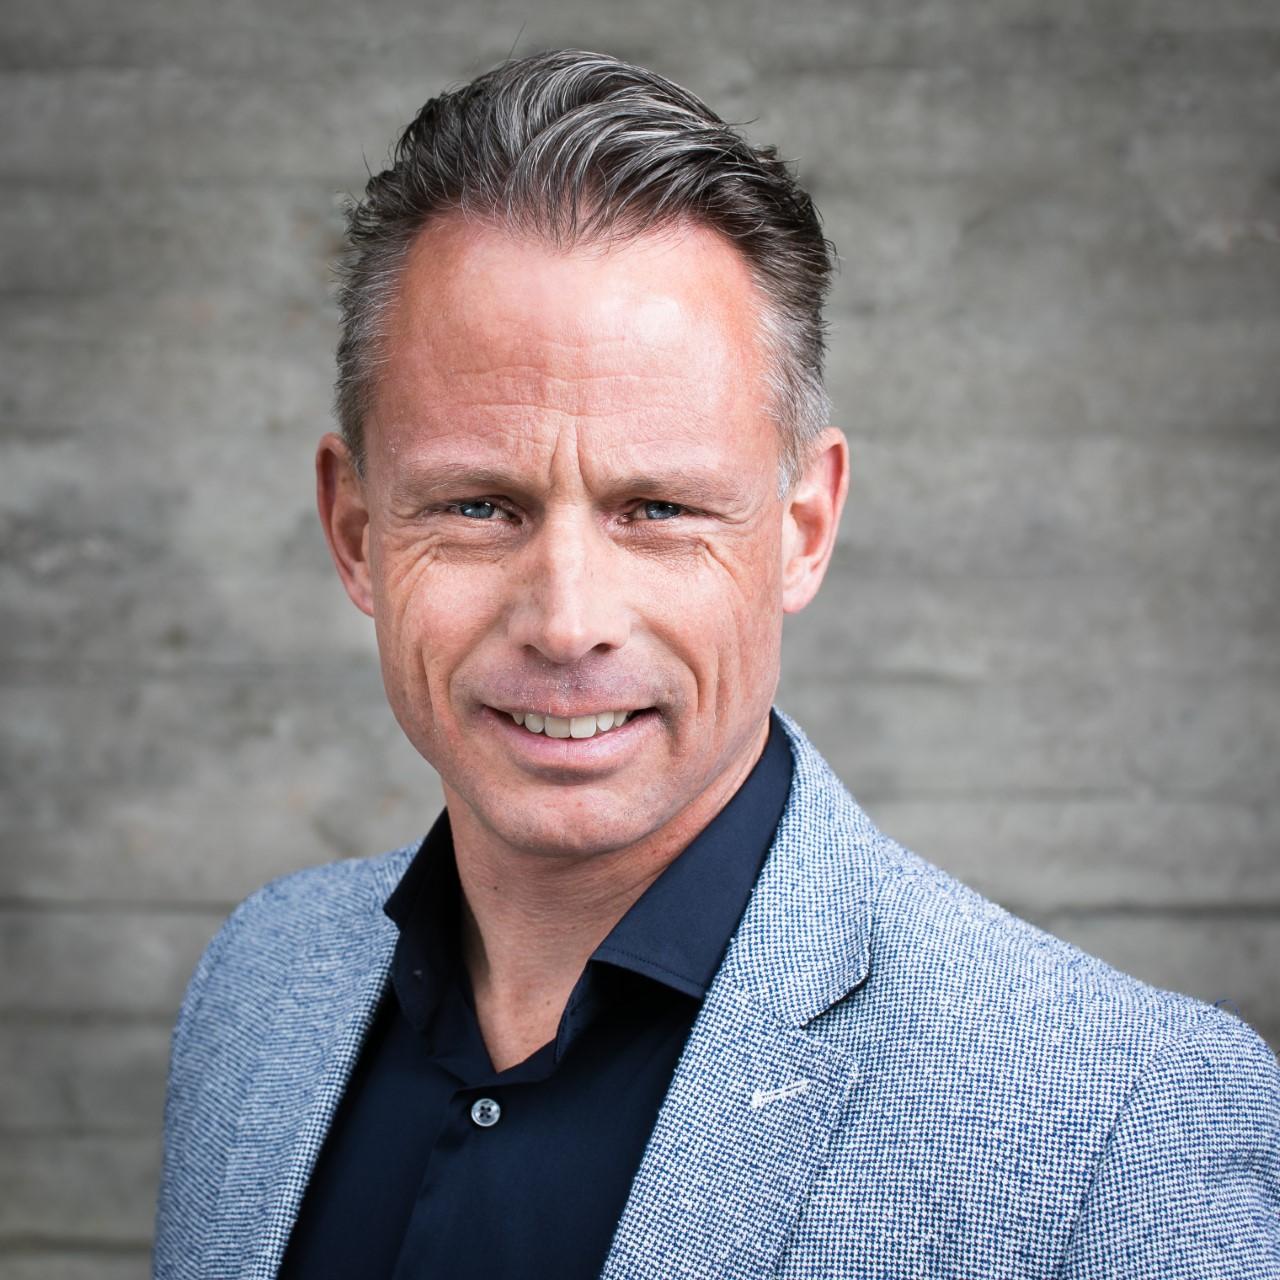 Peter Wiersema